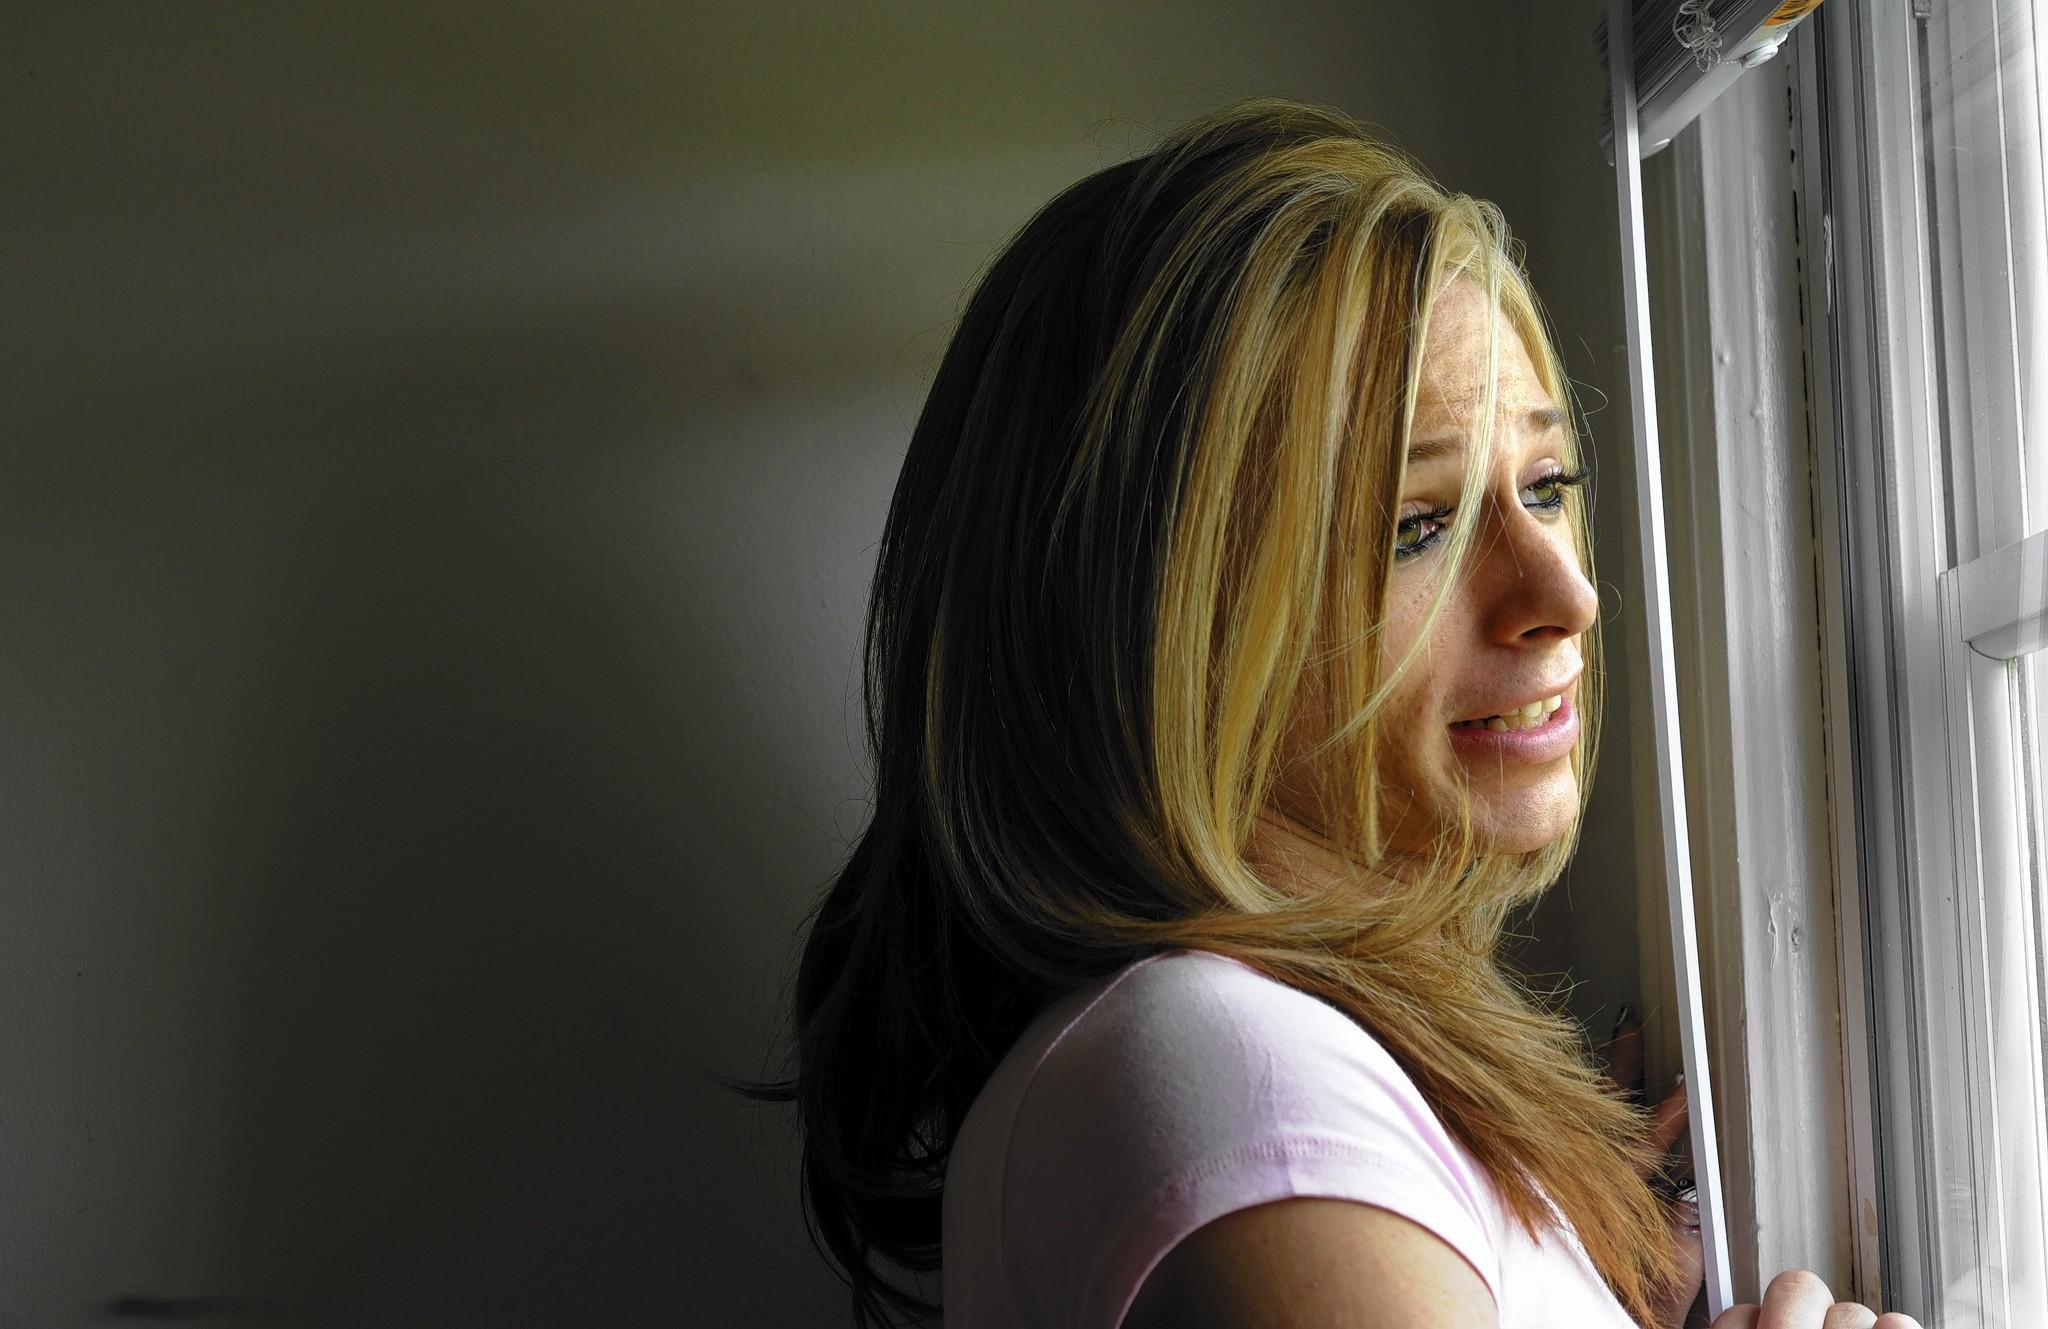 maryland law transgender